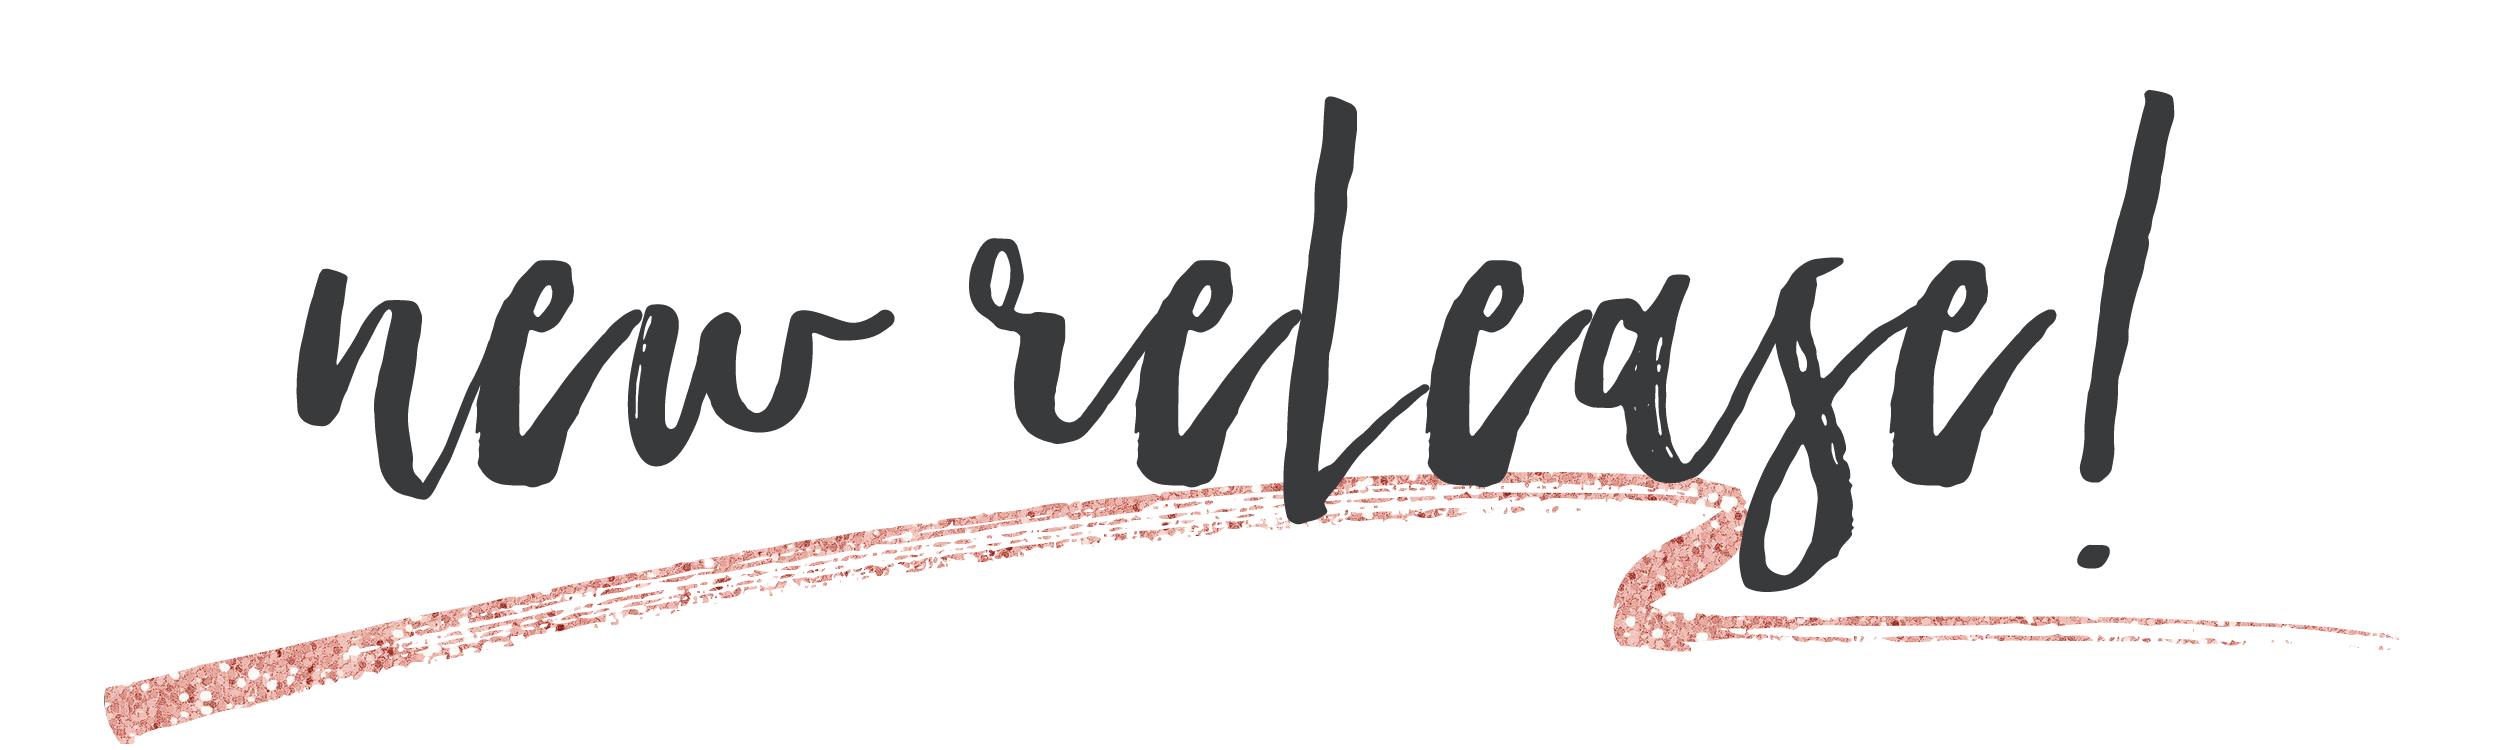 Karen Erickson's New Releases